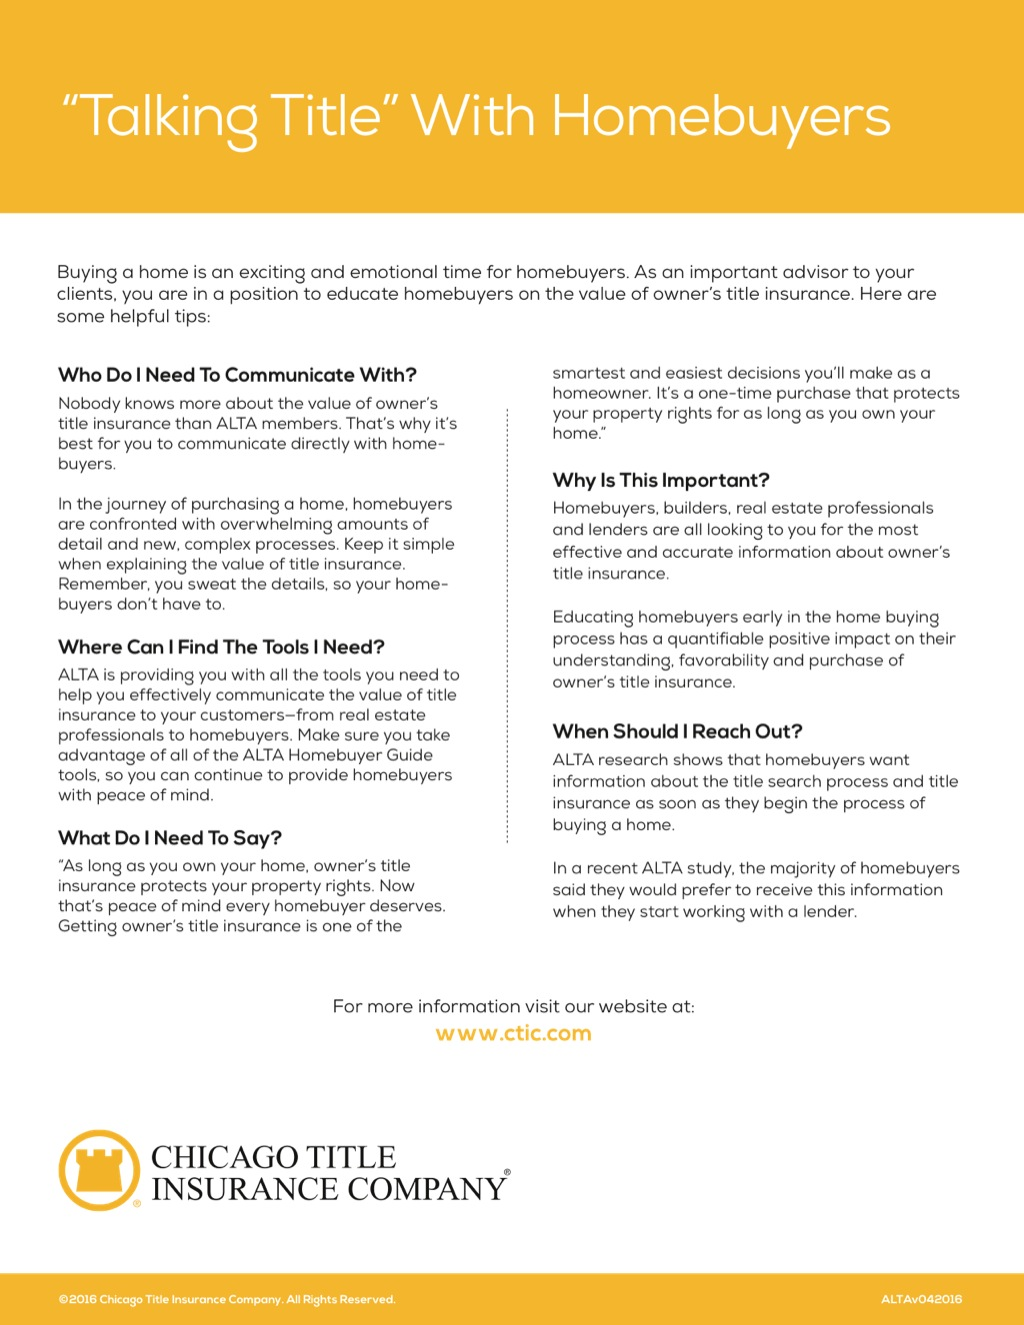 Corefact Talking title Homebuyers - CTIC